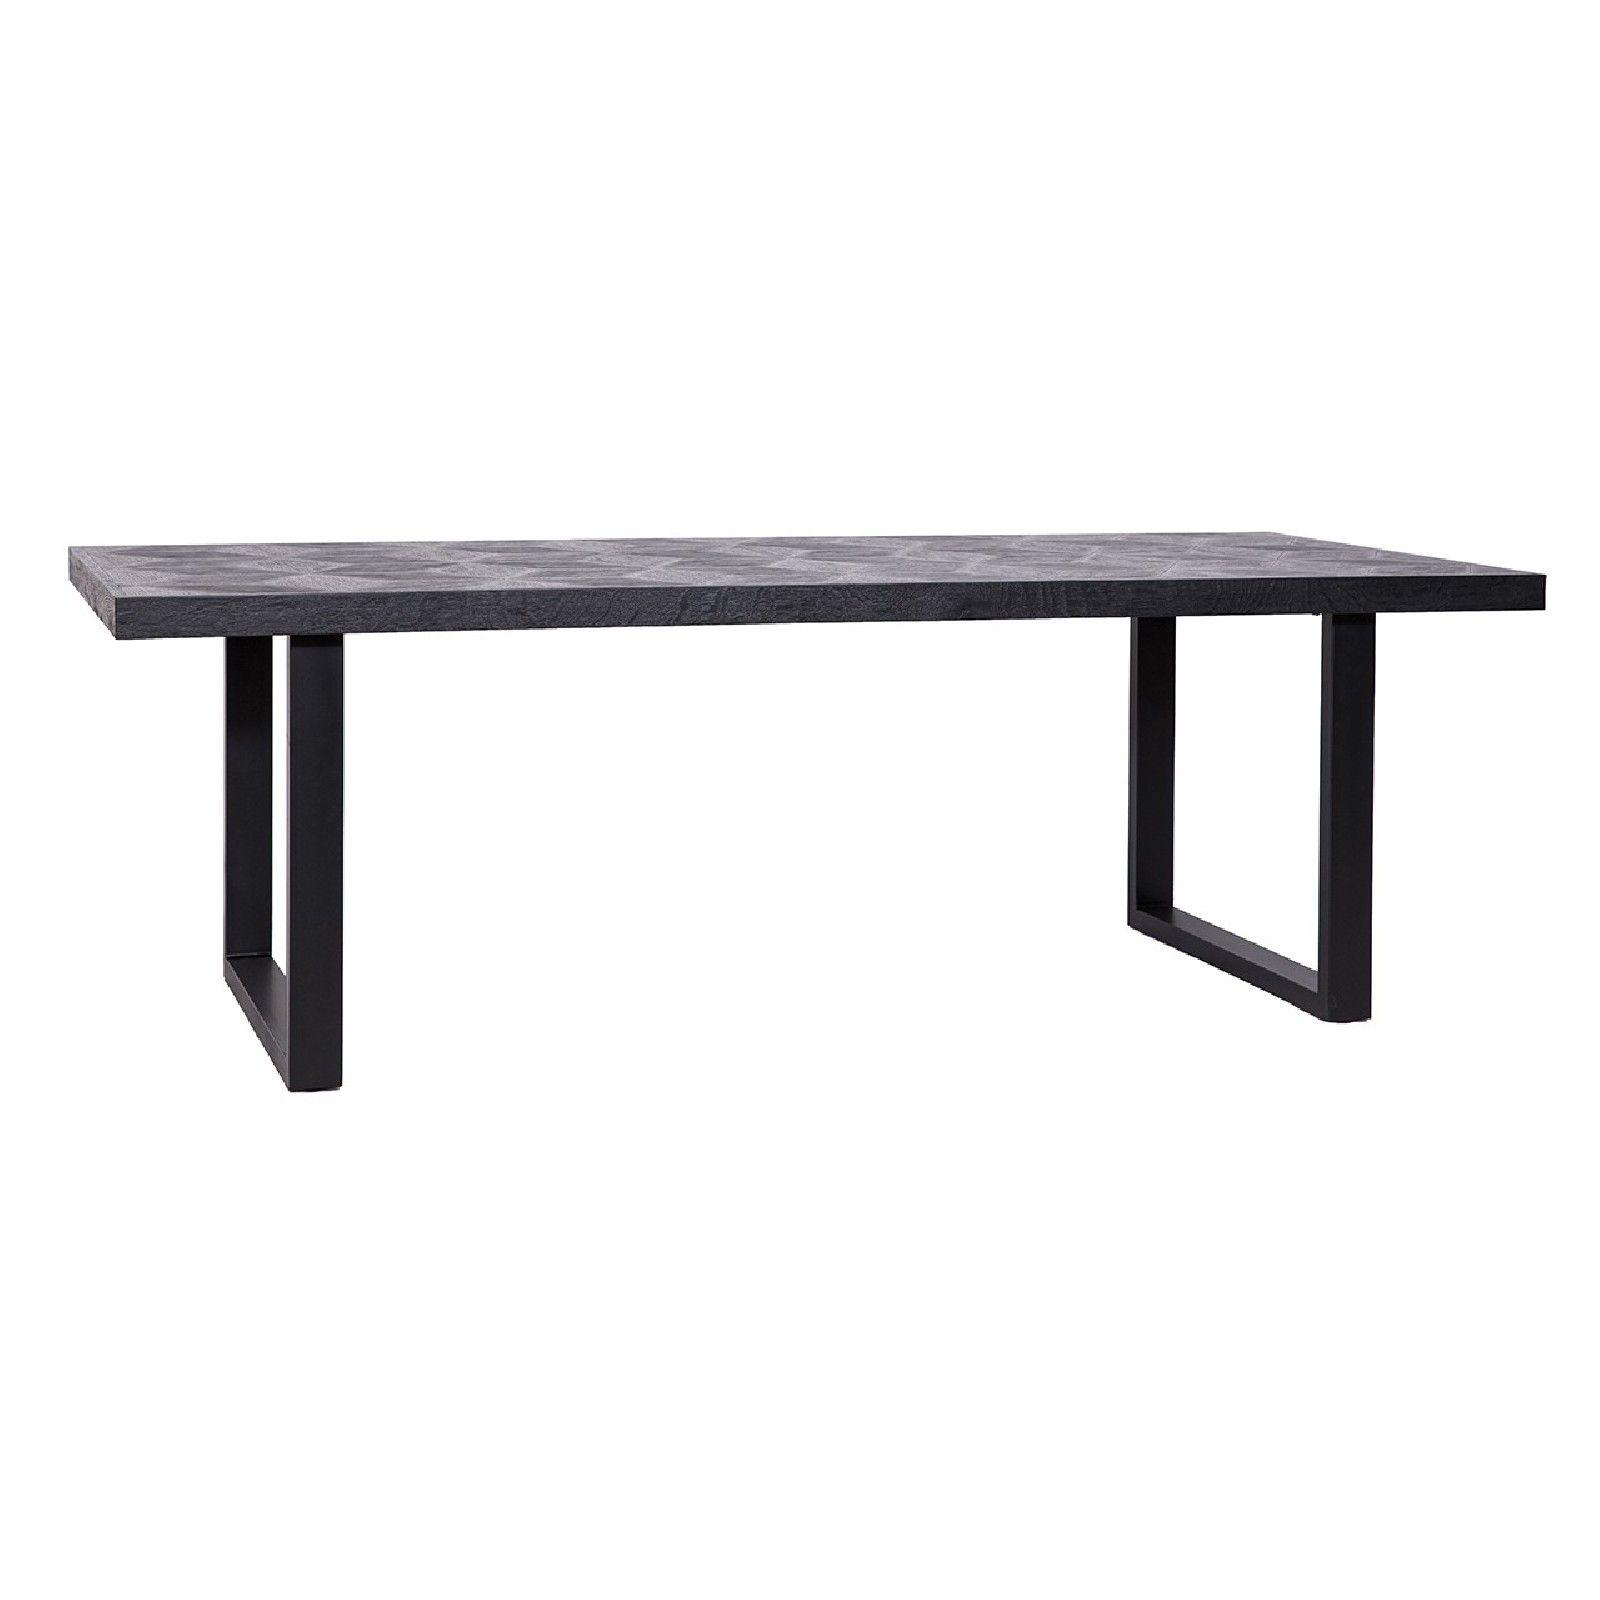 Table à dîner Blax 230x100 Meuble Déco Tendance - 4